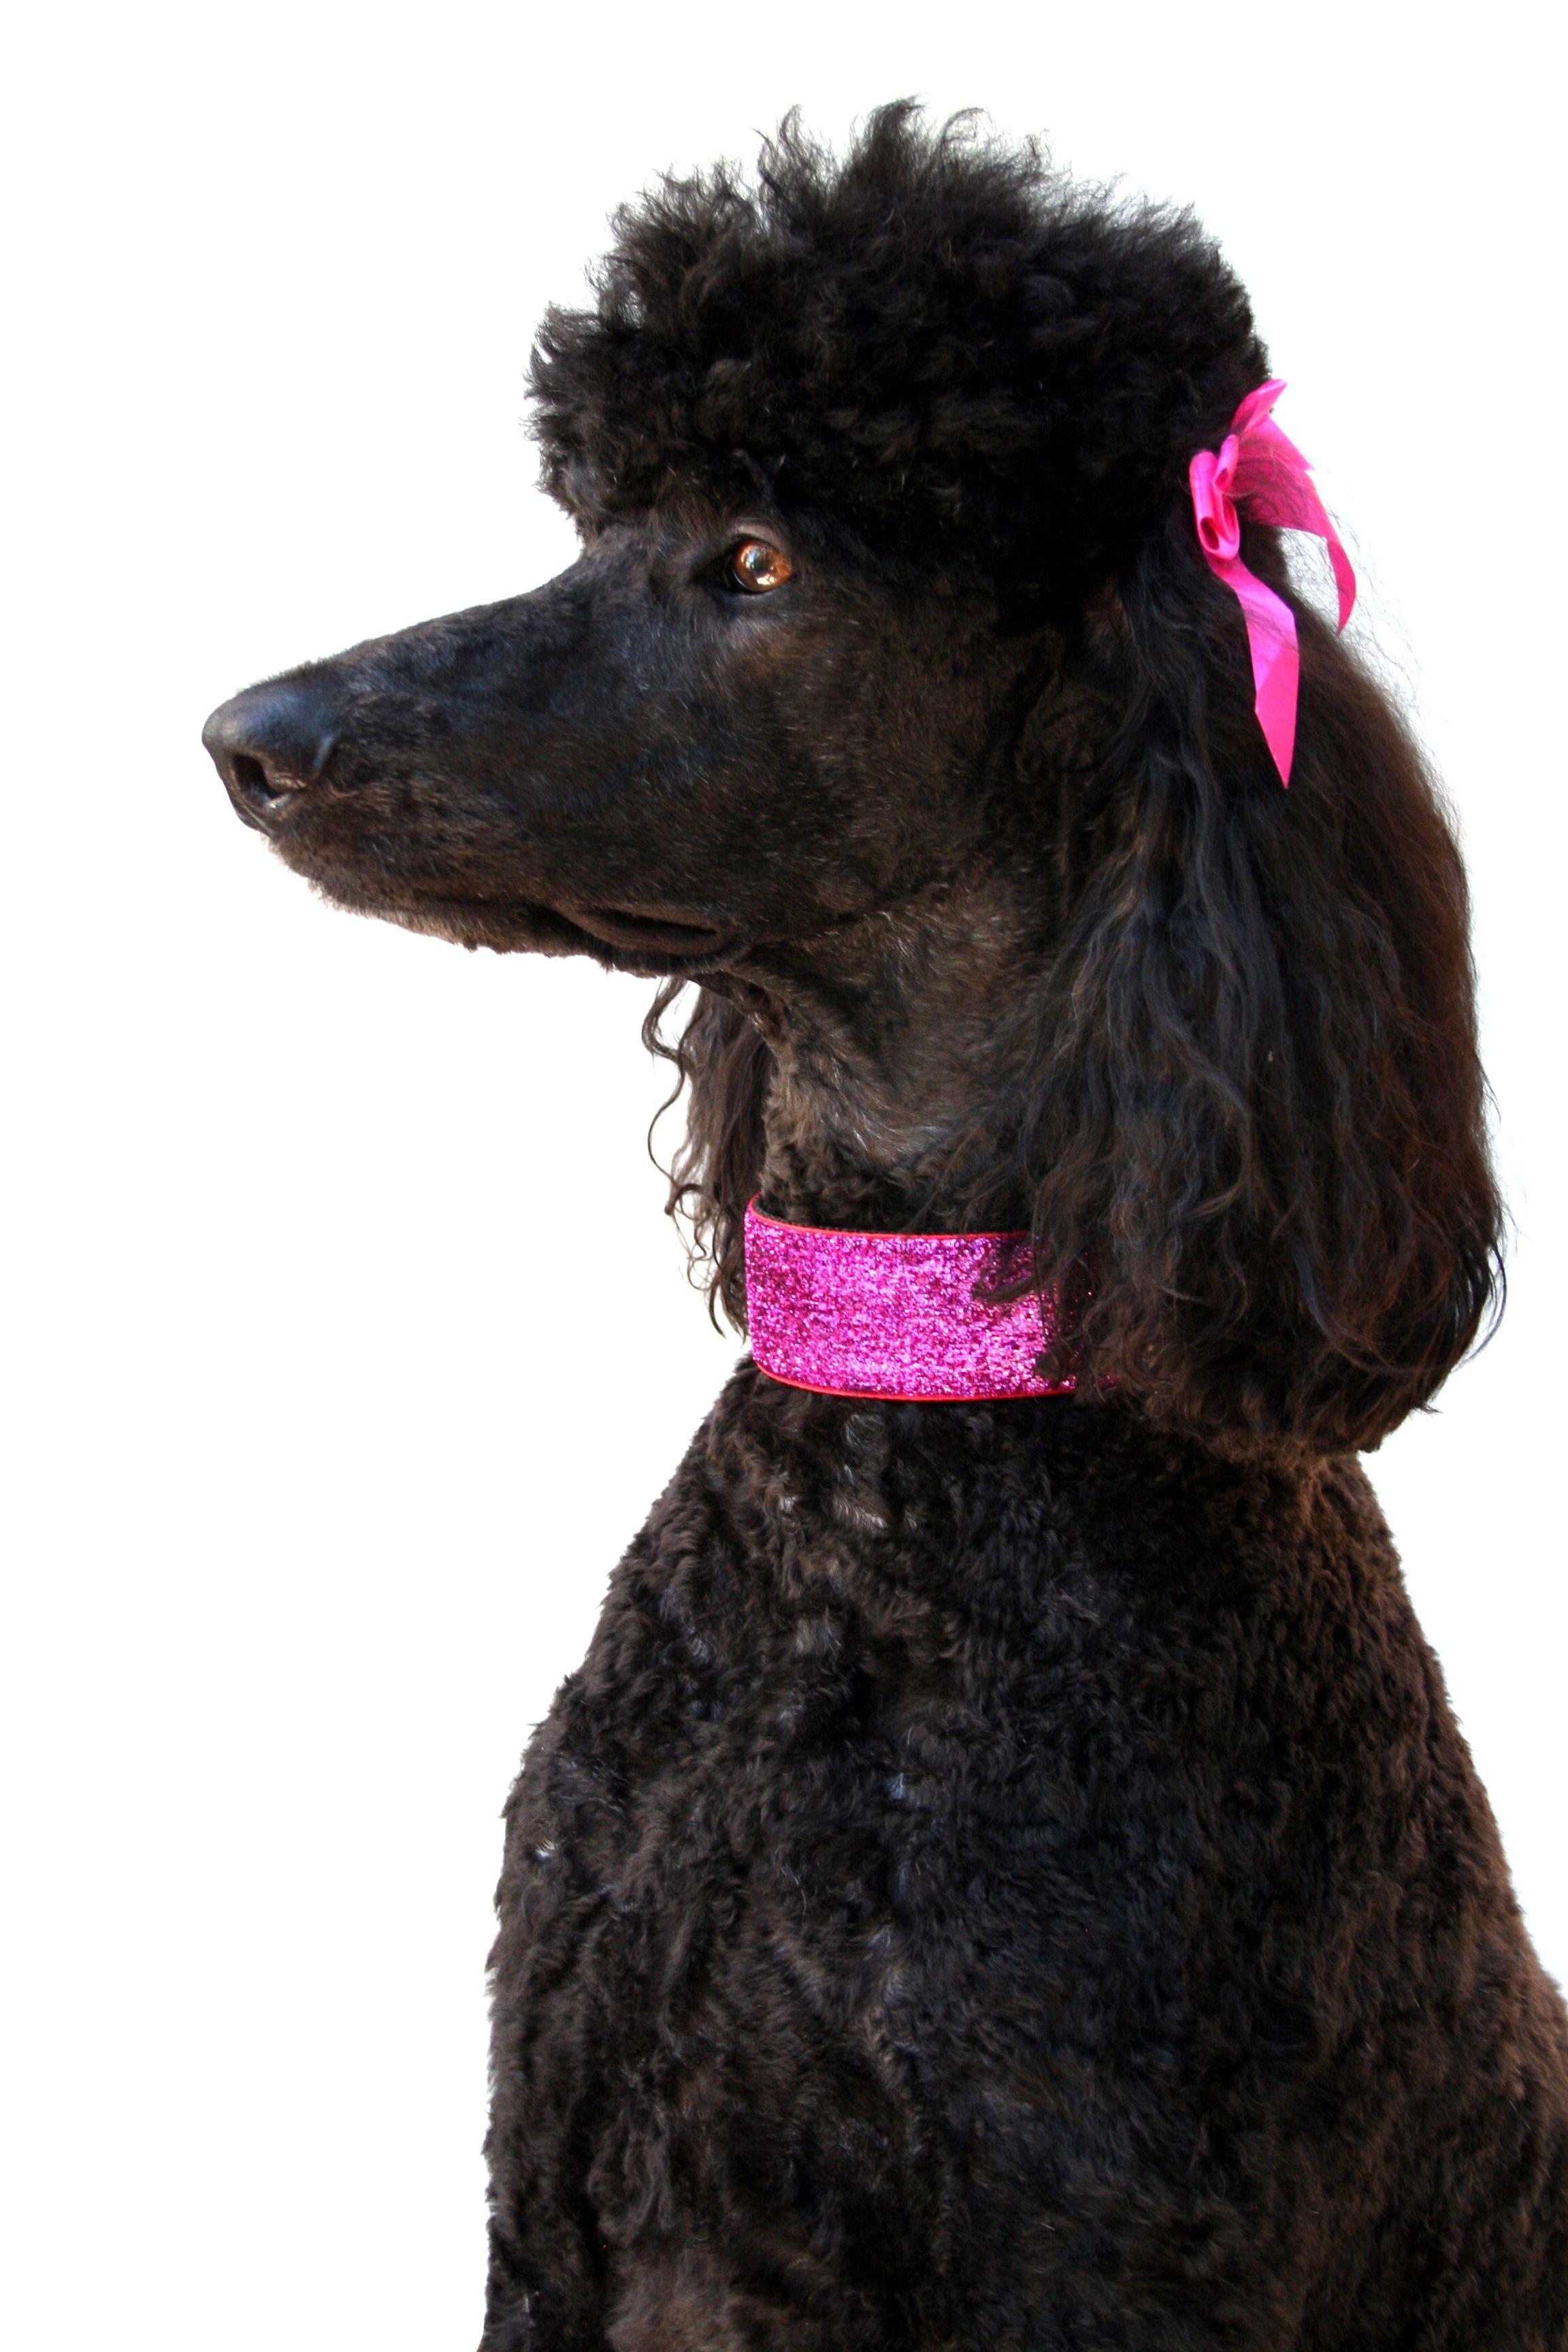 Standard Poodle Darla Wearing Her Pink Glitter Collar 3